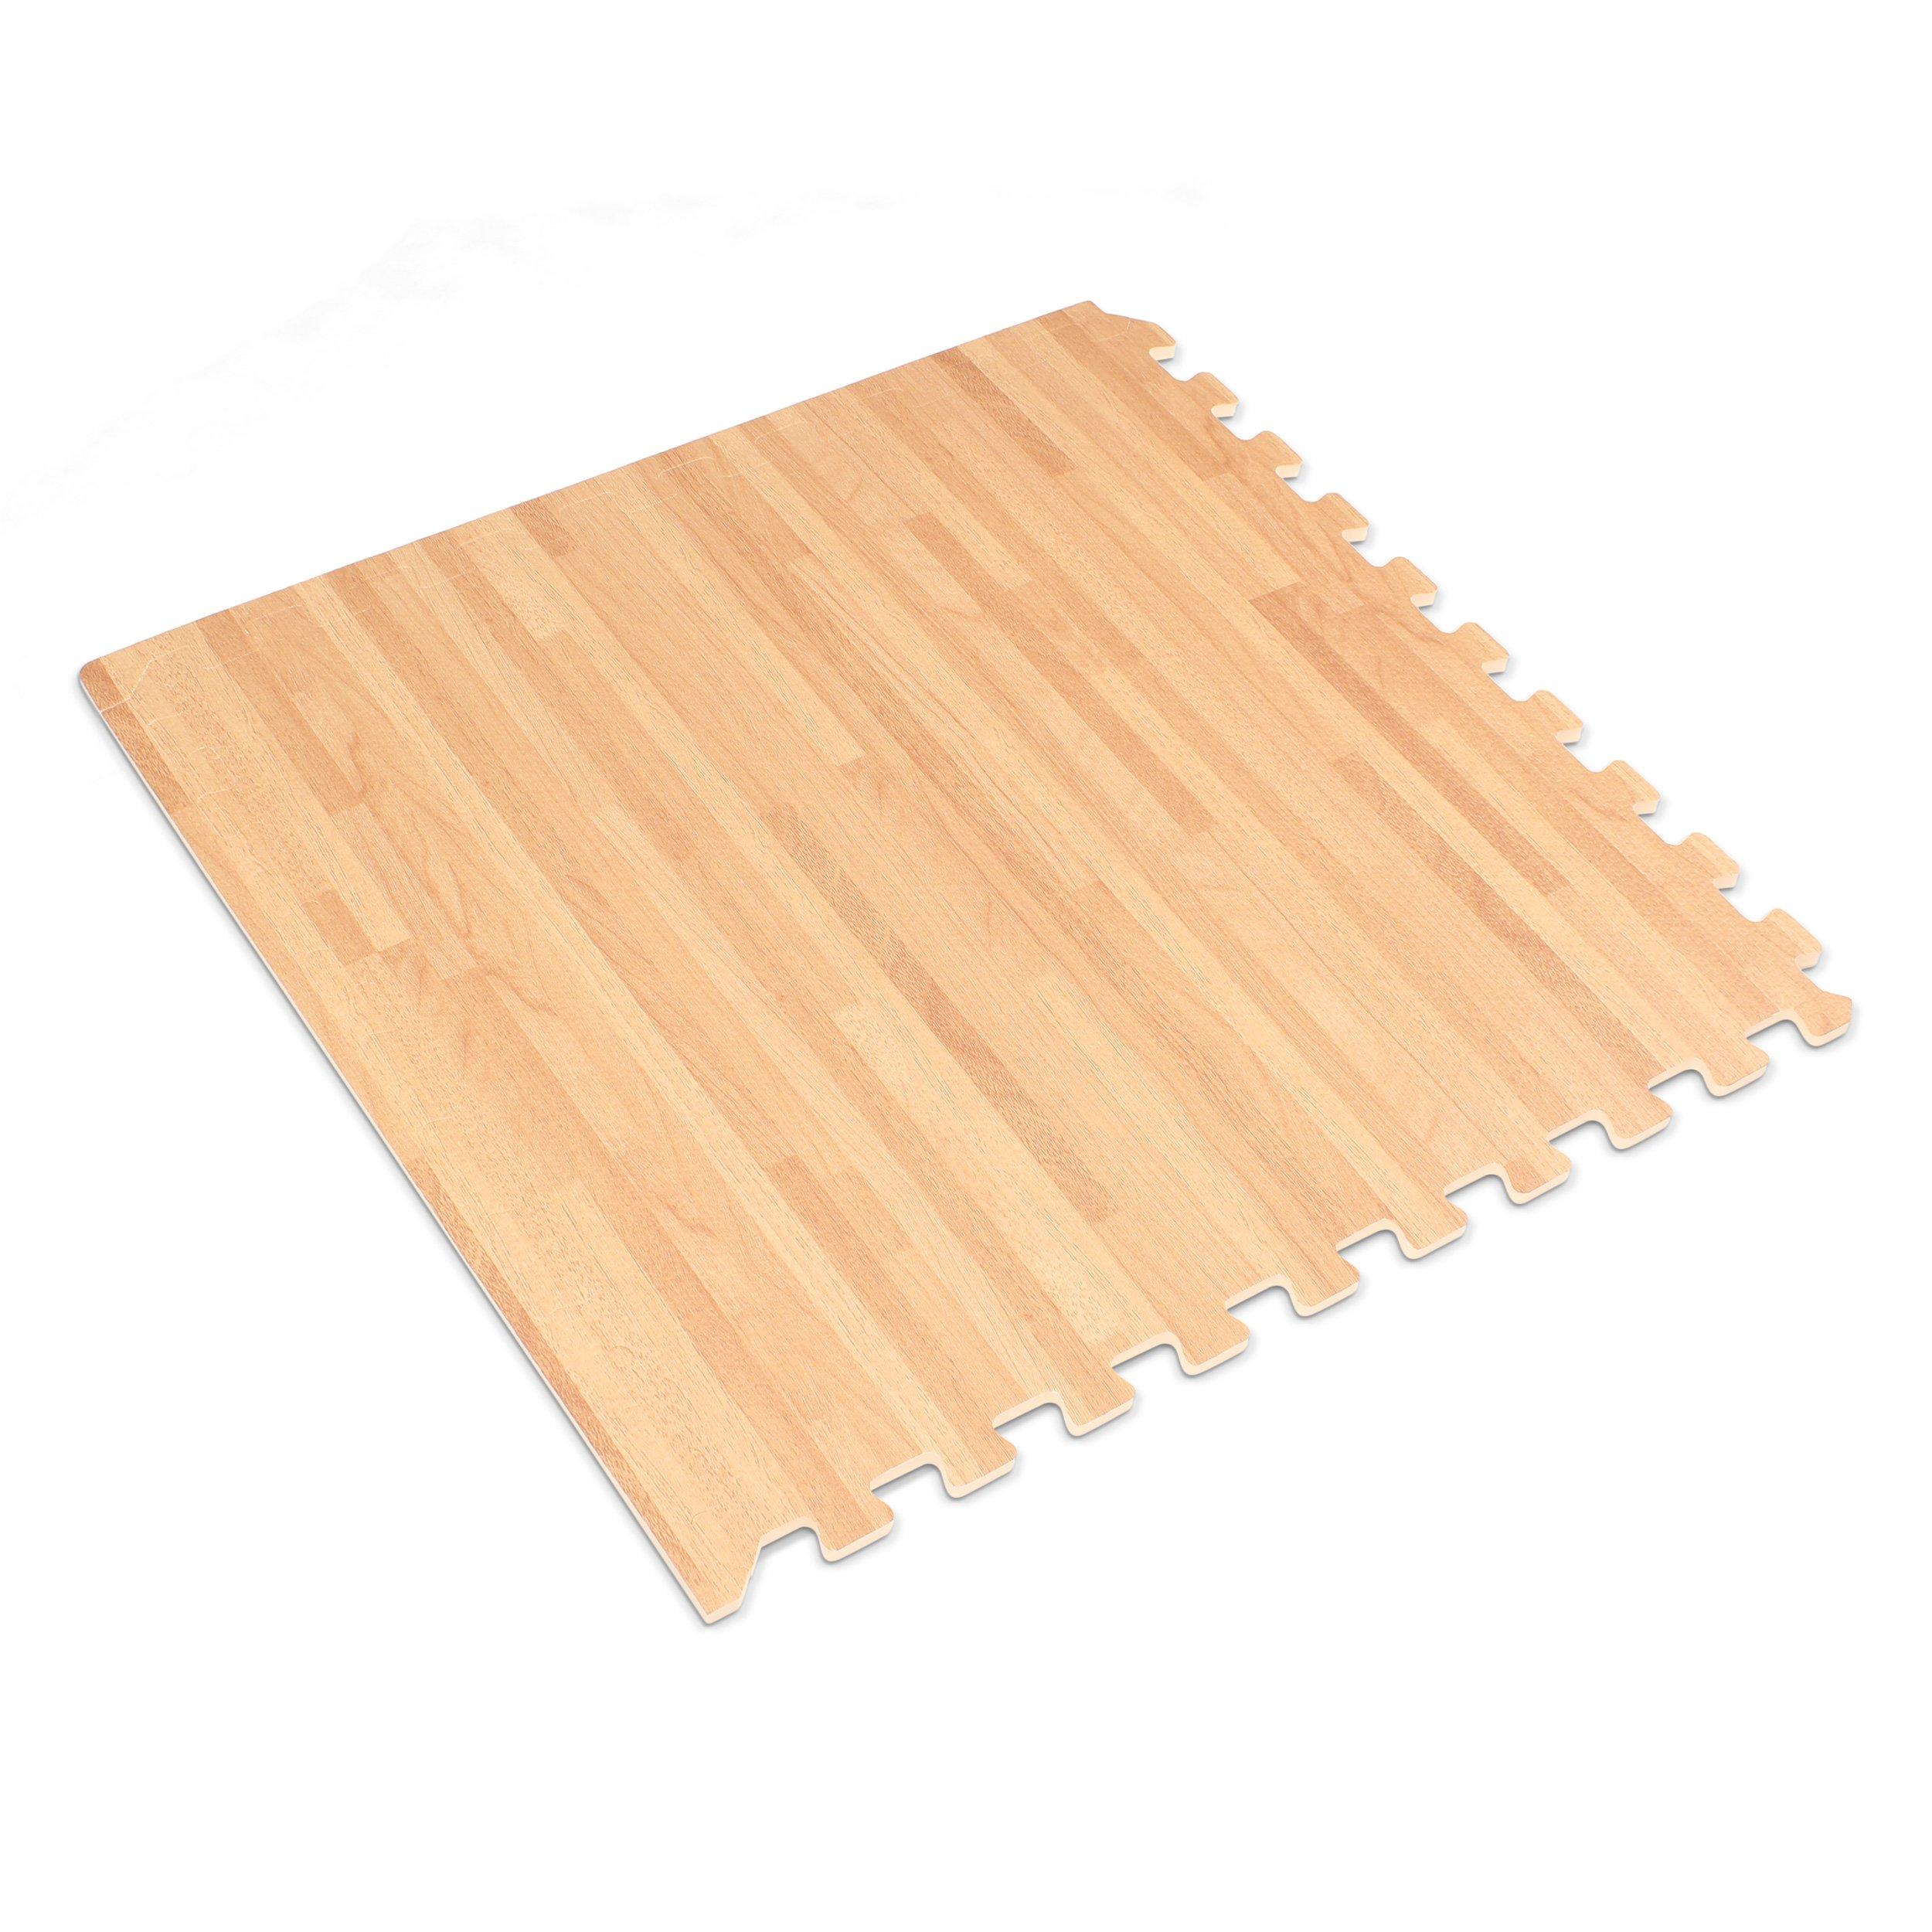 Forest Floor 3/8'' Thick Printed Wood Grain Interlocking Foam Floor Mats, 16 Sq Ft (4 Tiles), White Oak by Forest Floor (Image #2)